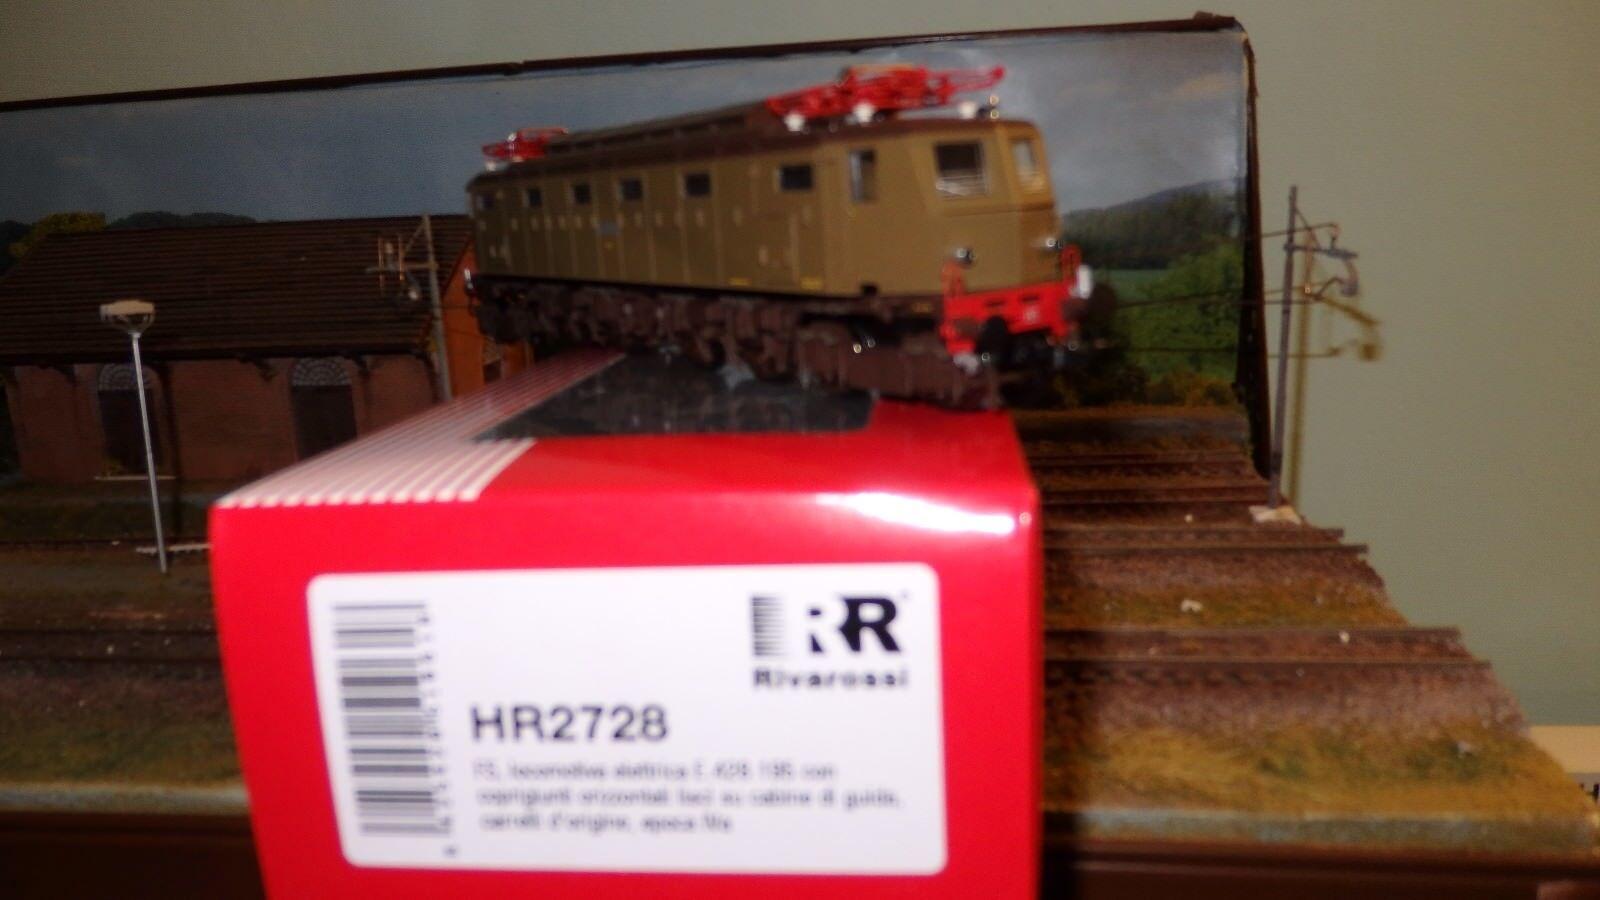 Rivarossi HR2728 E428 195 TERZA SERIE semiaerodinamica  Carrelli di origine,FS